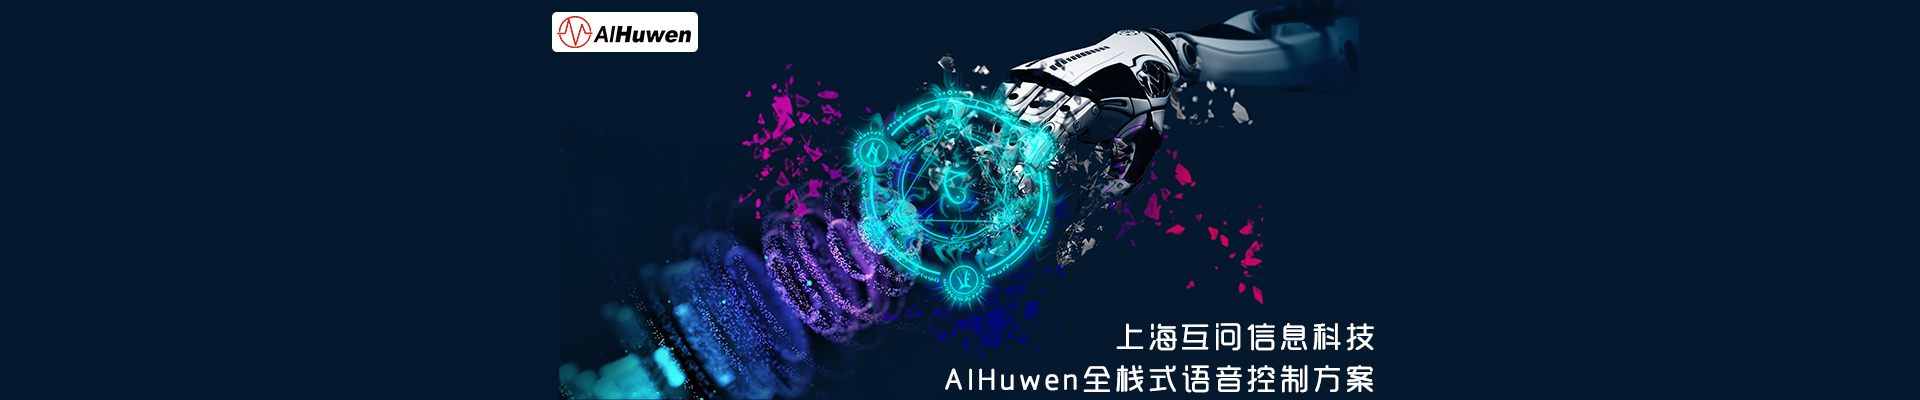 AIHuwen(互问科技)全栈式语音控制方案